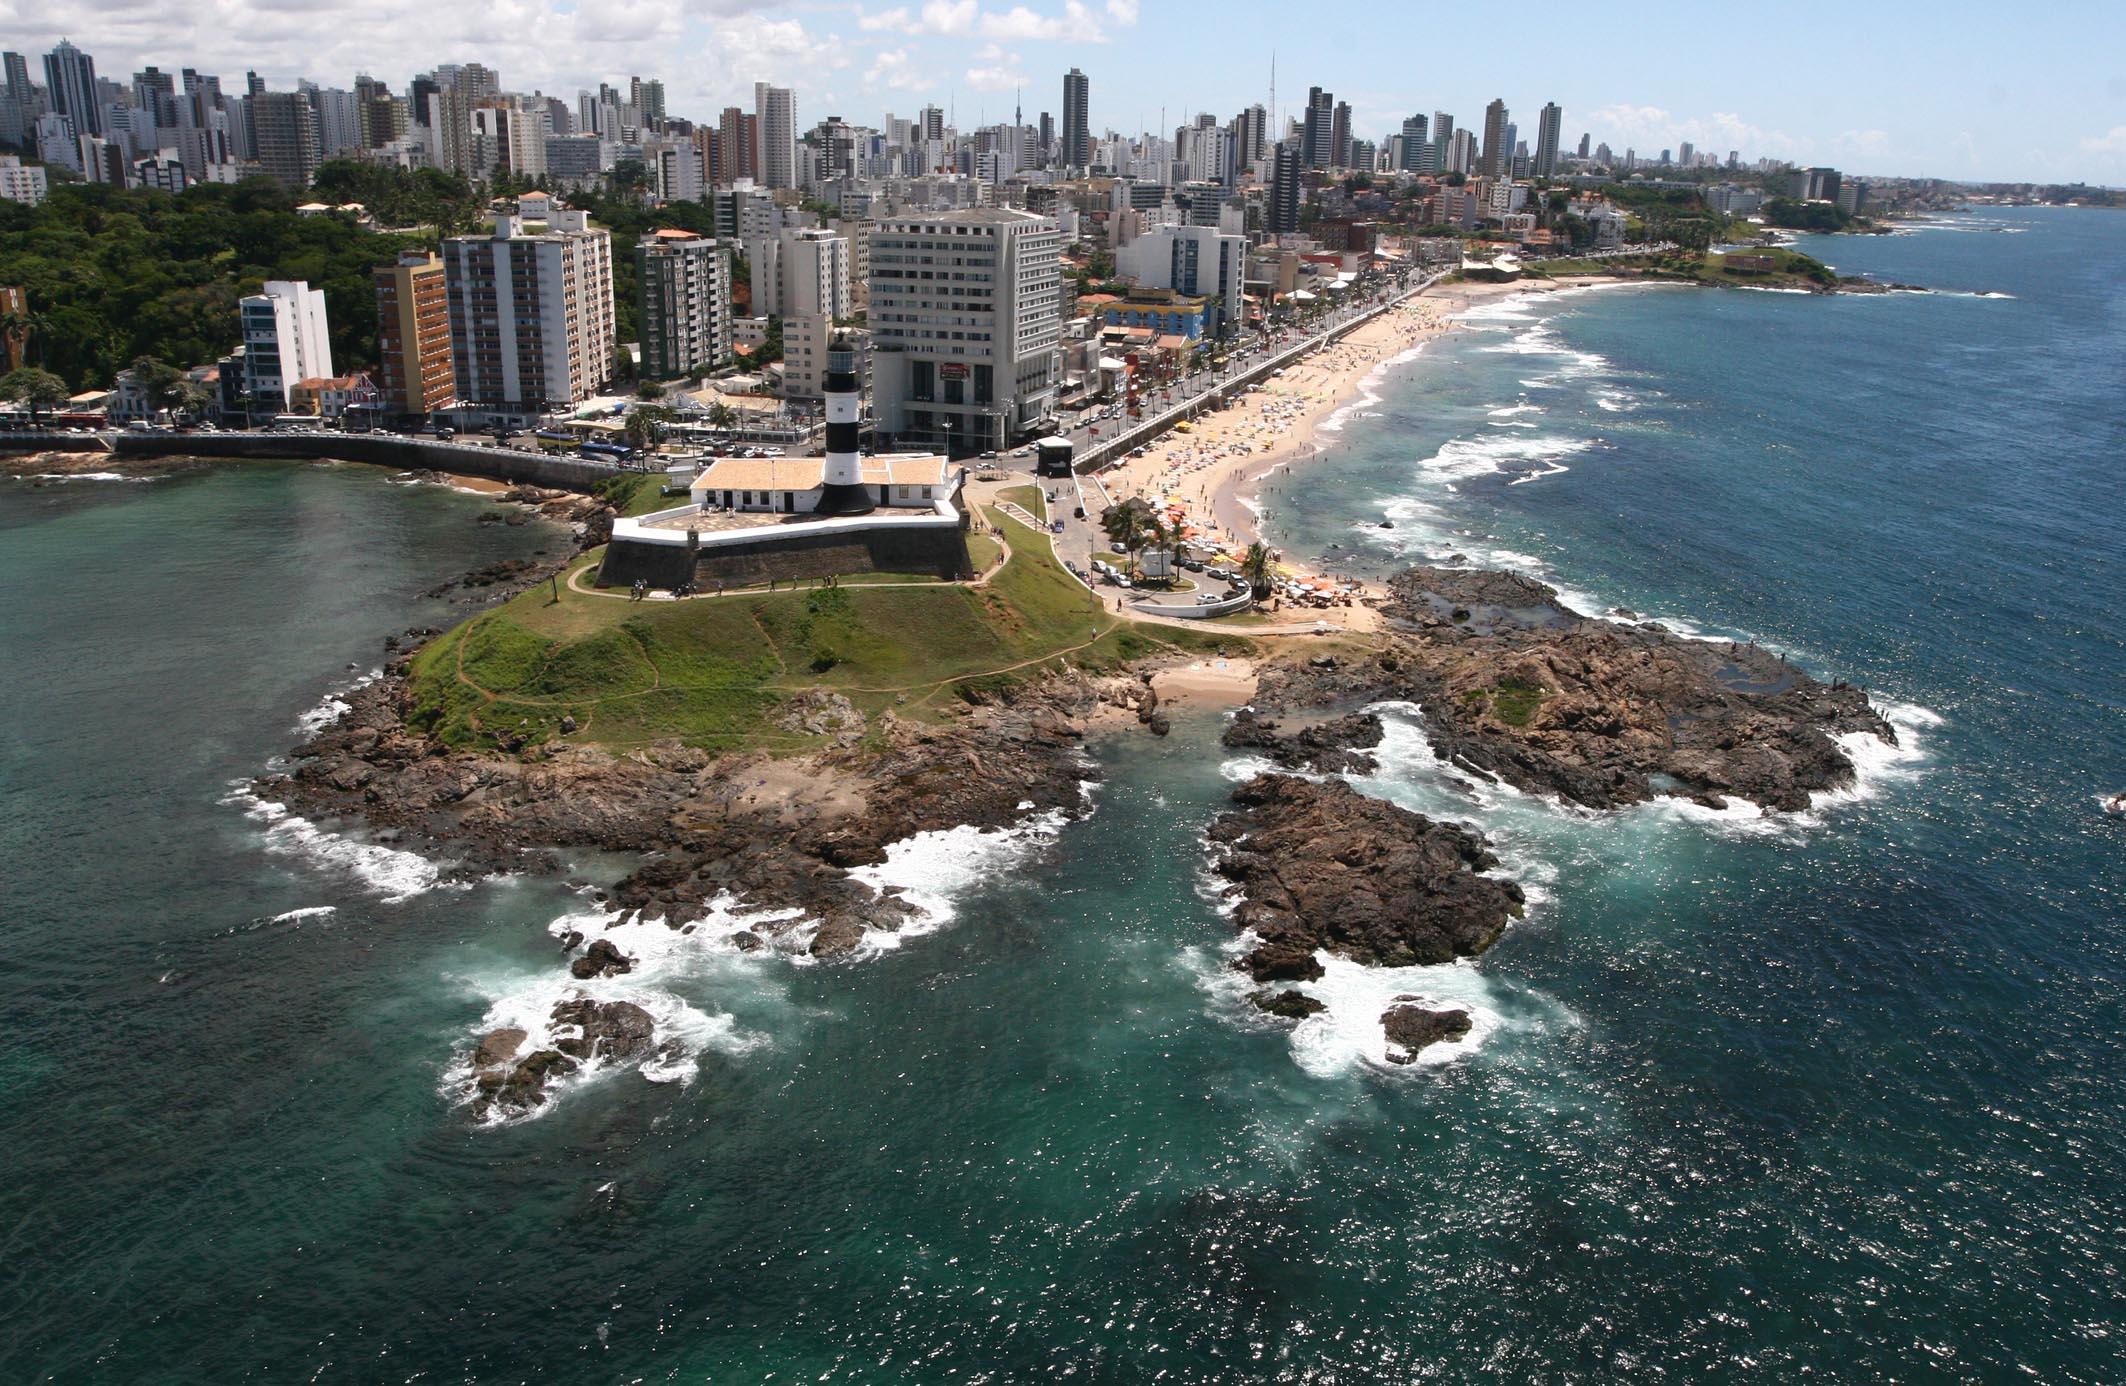 http://upload.wikimedia.org/wikipedia/commons/b/bf/Salvador_BA.jpg